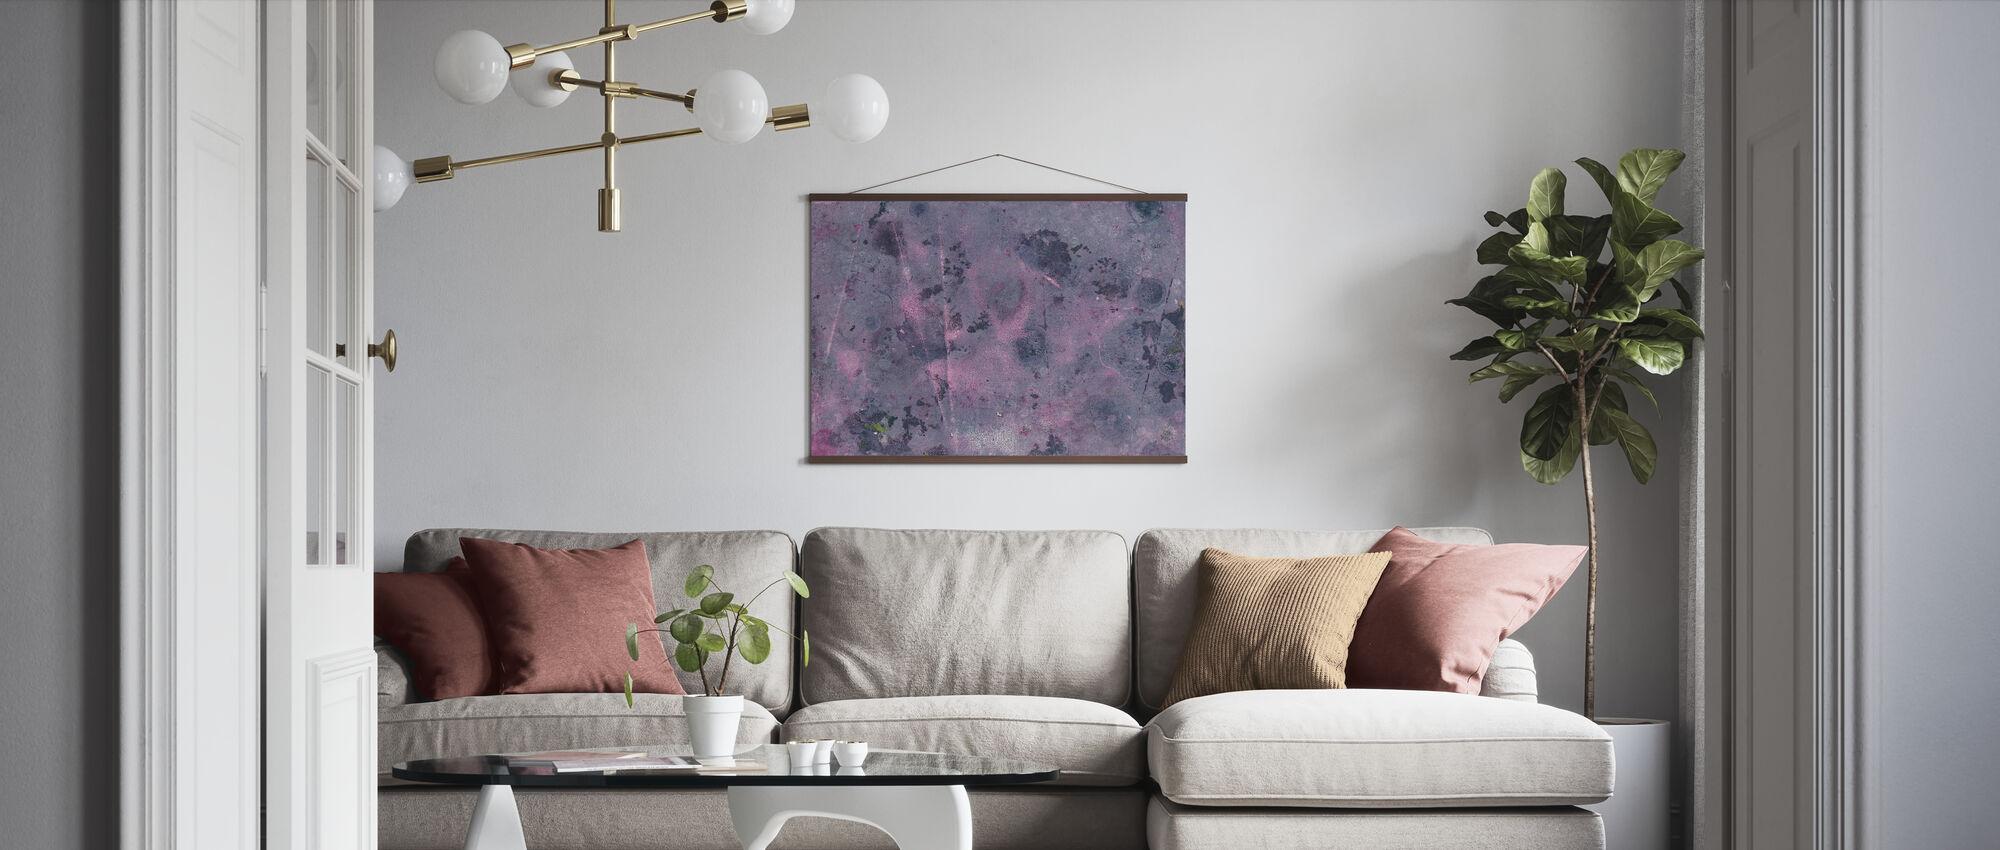 Torn Graffiti Wall - Poster - Living Room